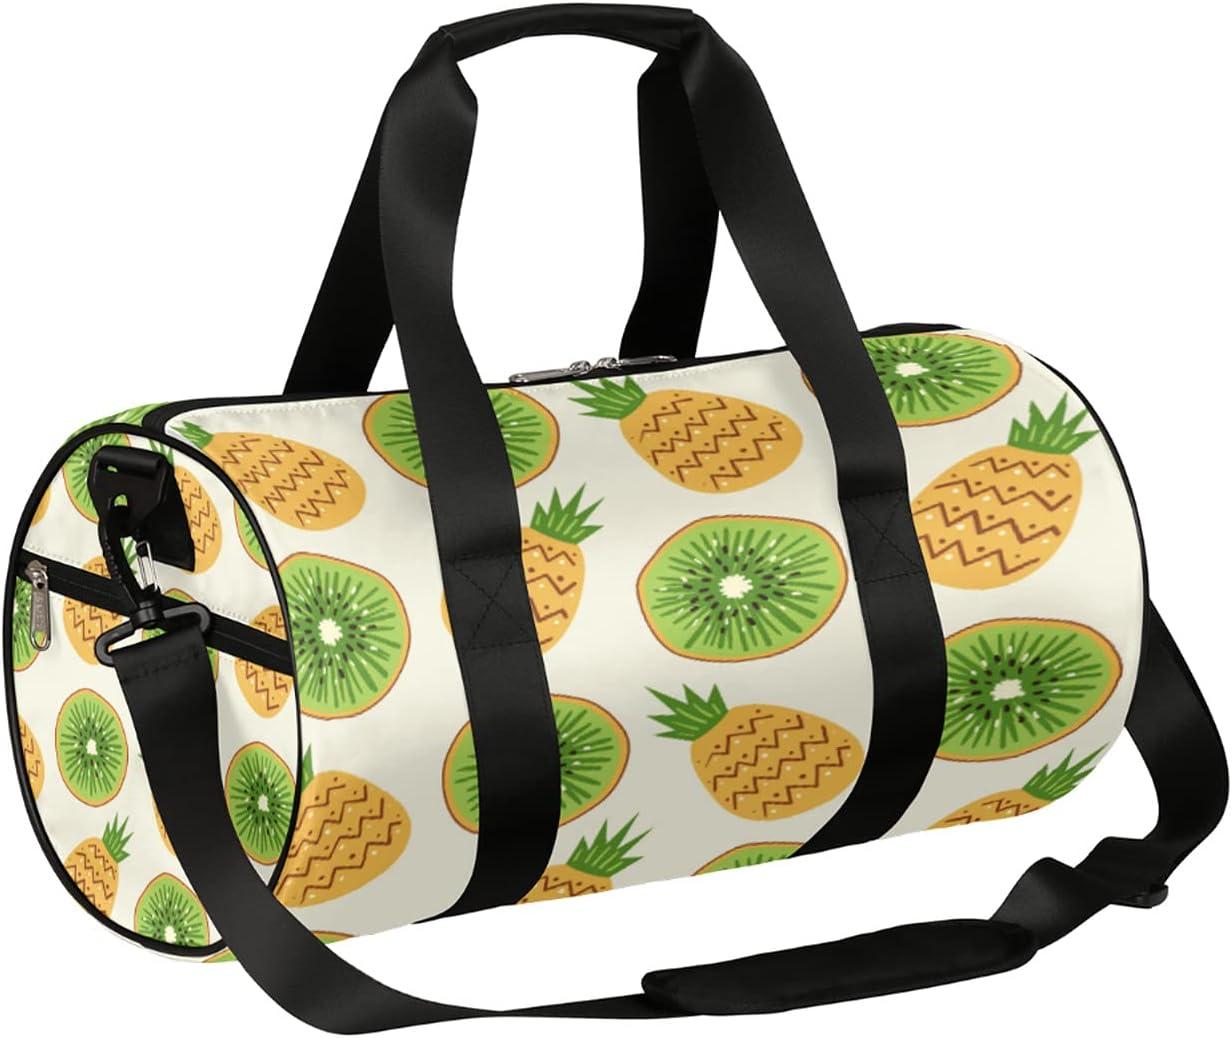 Sport Gym Phoenix Mall Bag Cute Fruit Kiwi Super sale period limited Pineapple Duffel lightwe Small